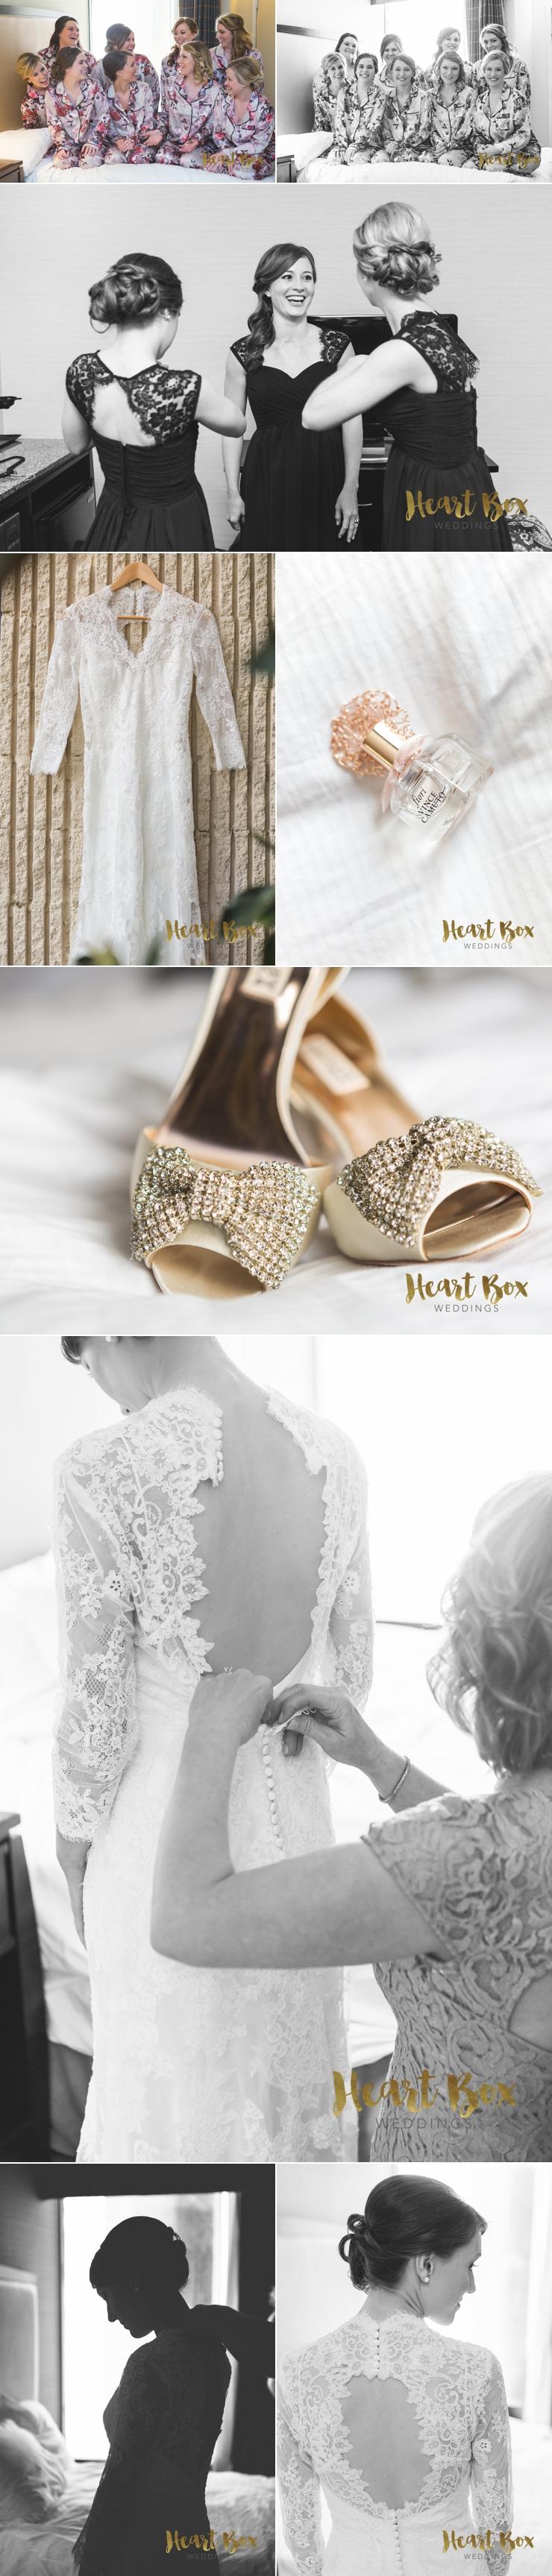 Fegan Wedding Blog Collages 2.jpg